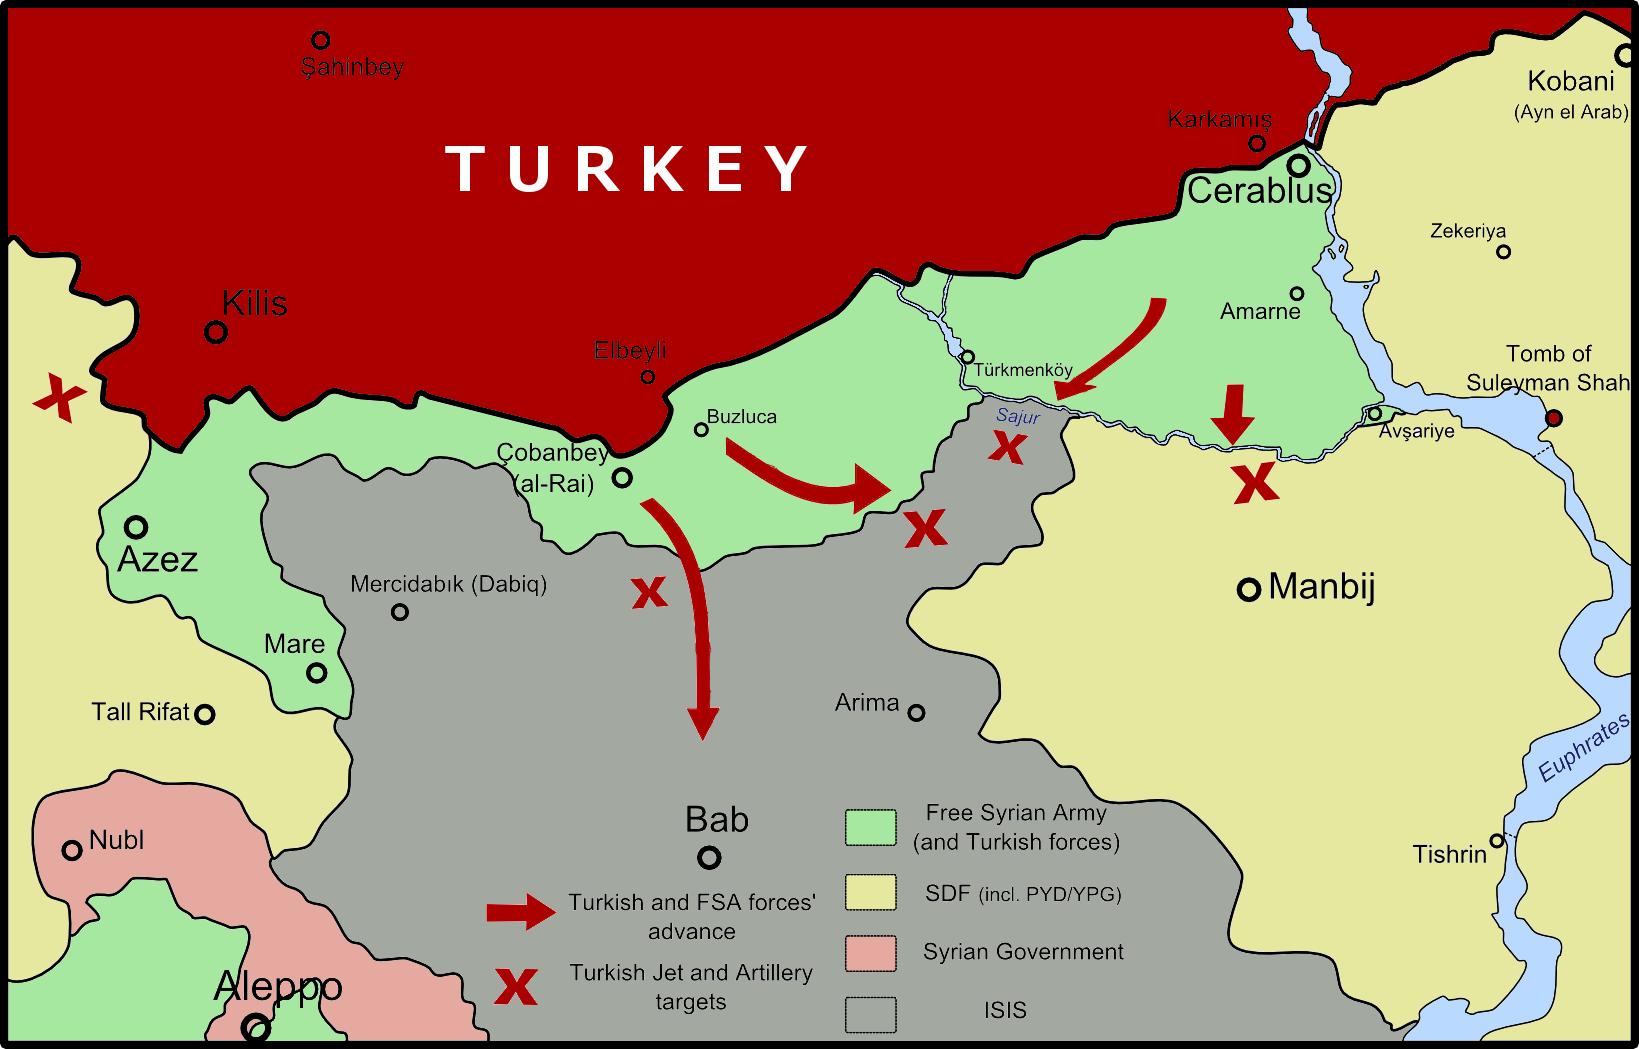 Turkish_Offensive_in_Northern_Syria